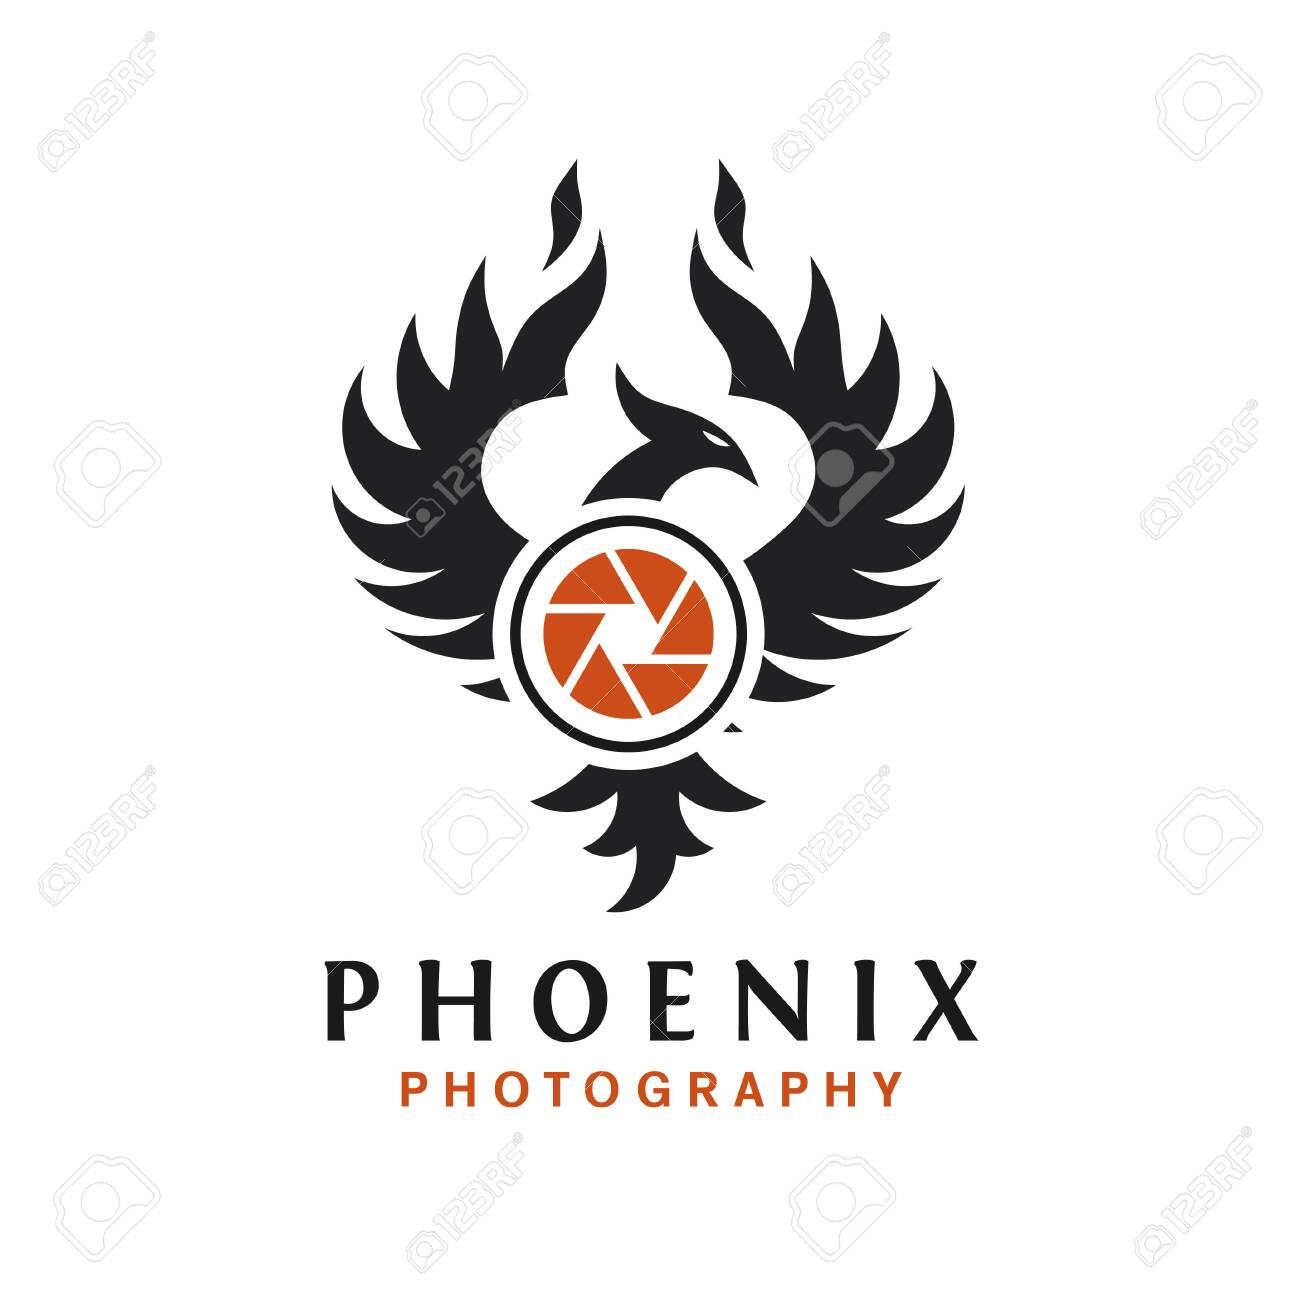 Phoenix Photography Logo Design Camera Logo With Phoenix Bird Royalty Free Cliparts Vectors And Stock Illustration Image 138772878